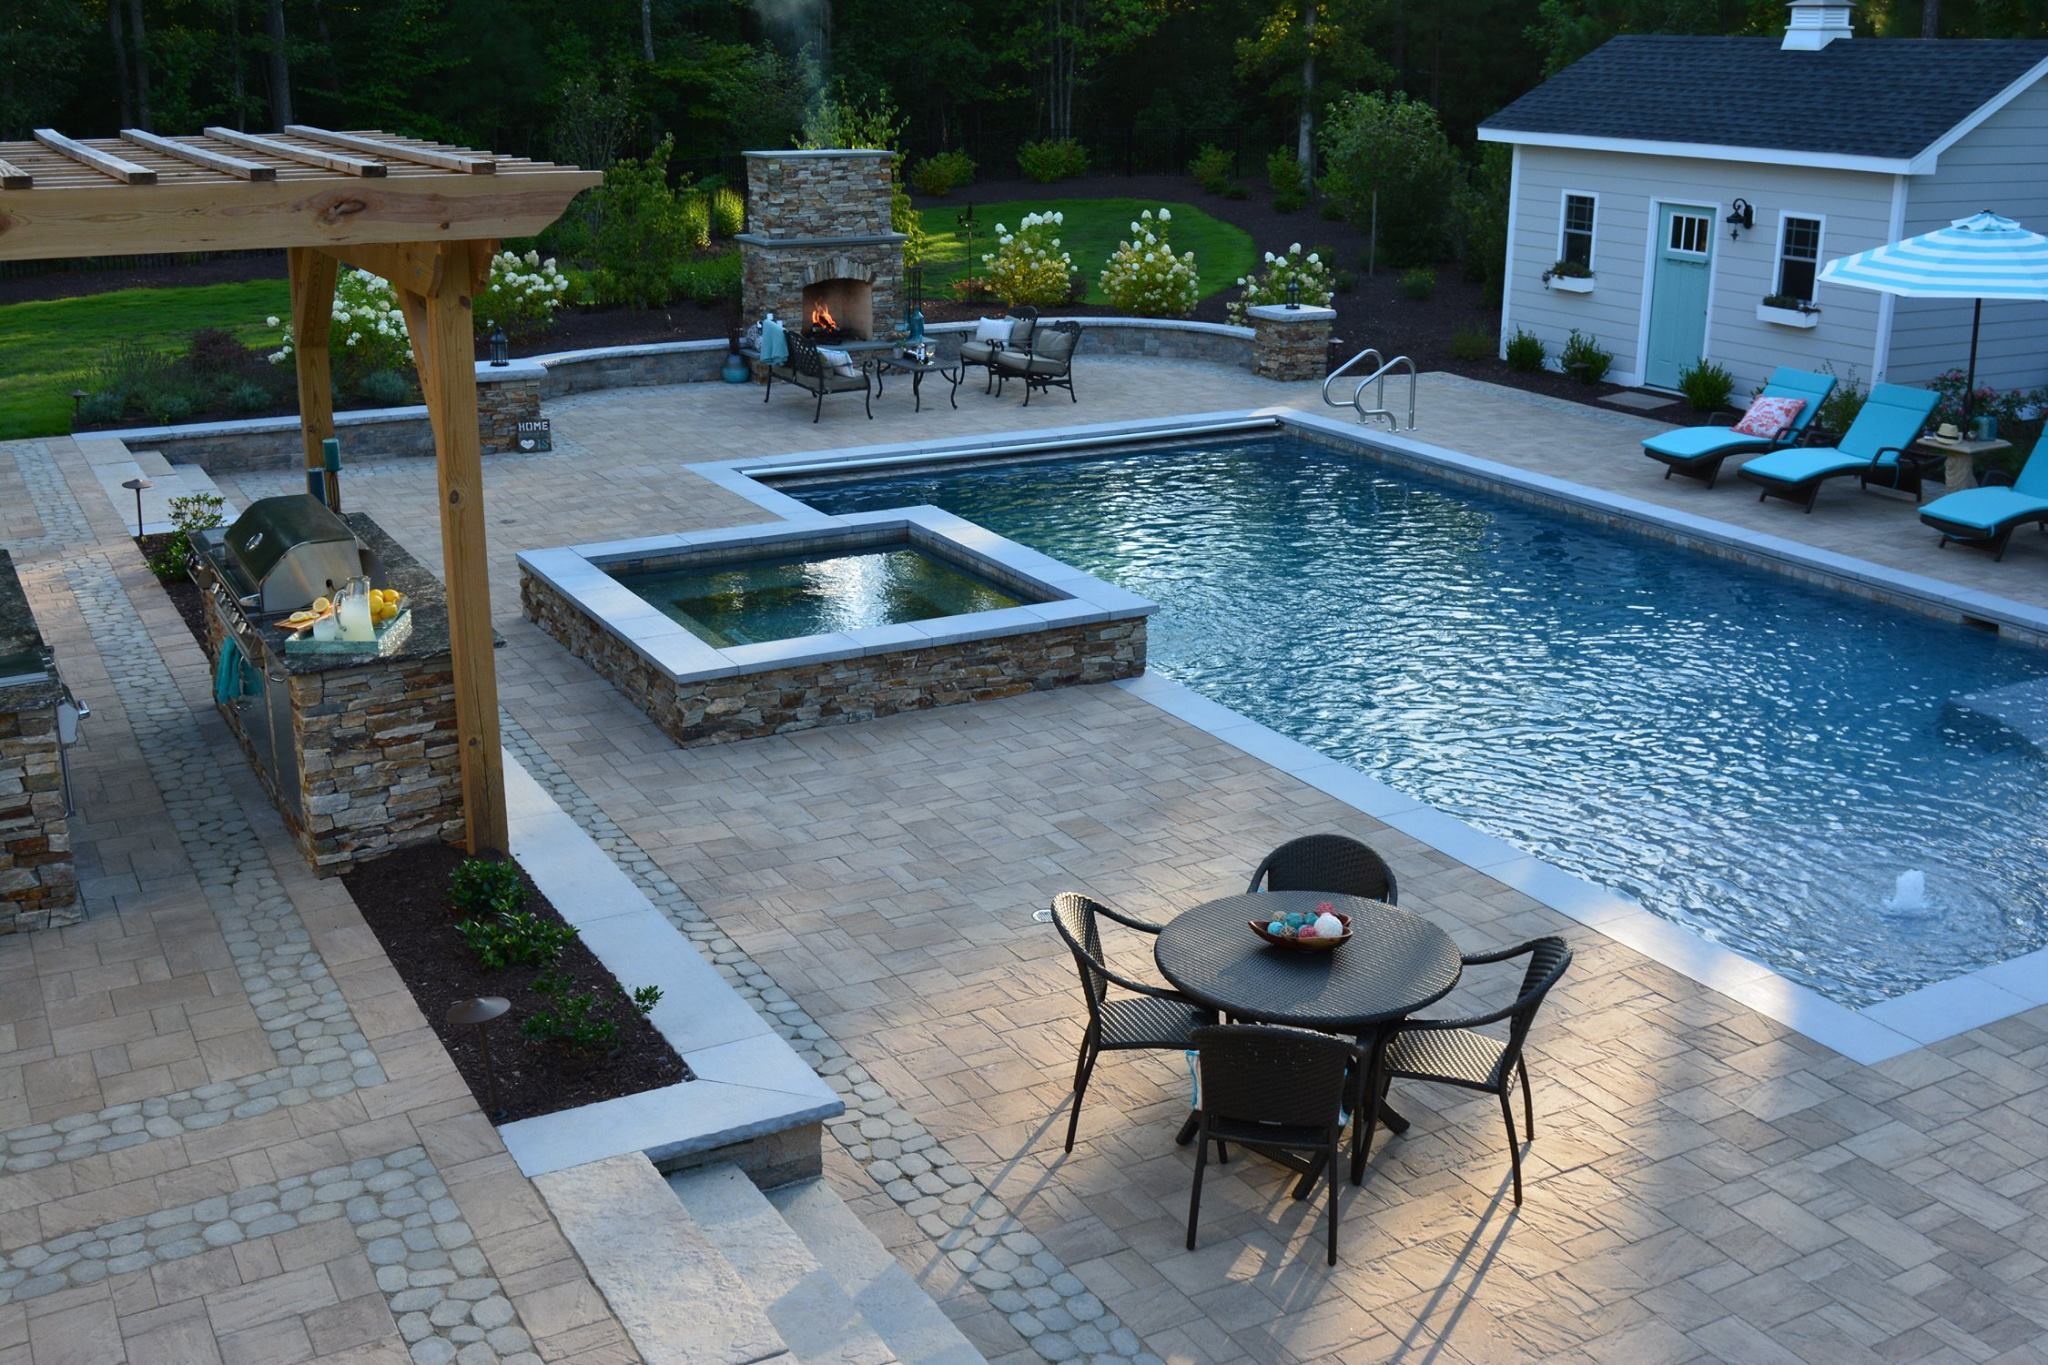 Spa Residential Rectangle Pool Tanning Shelf